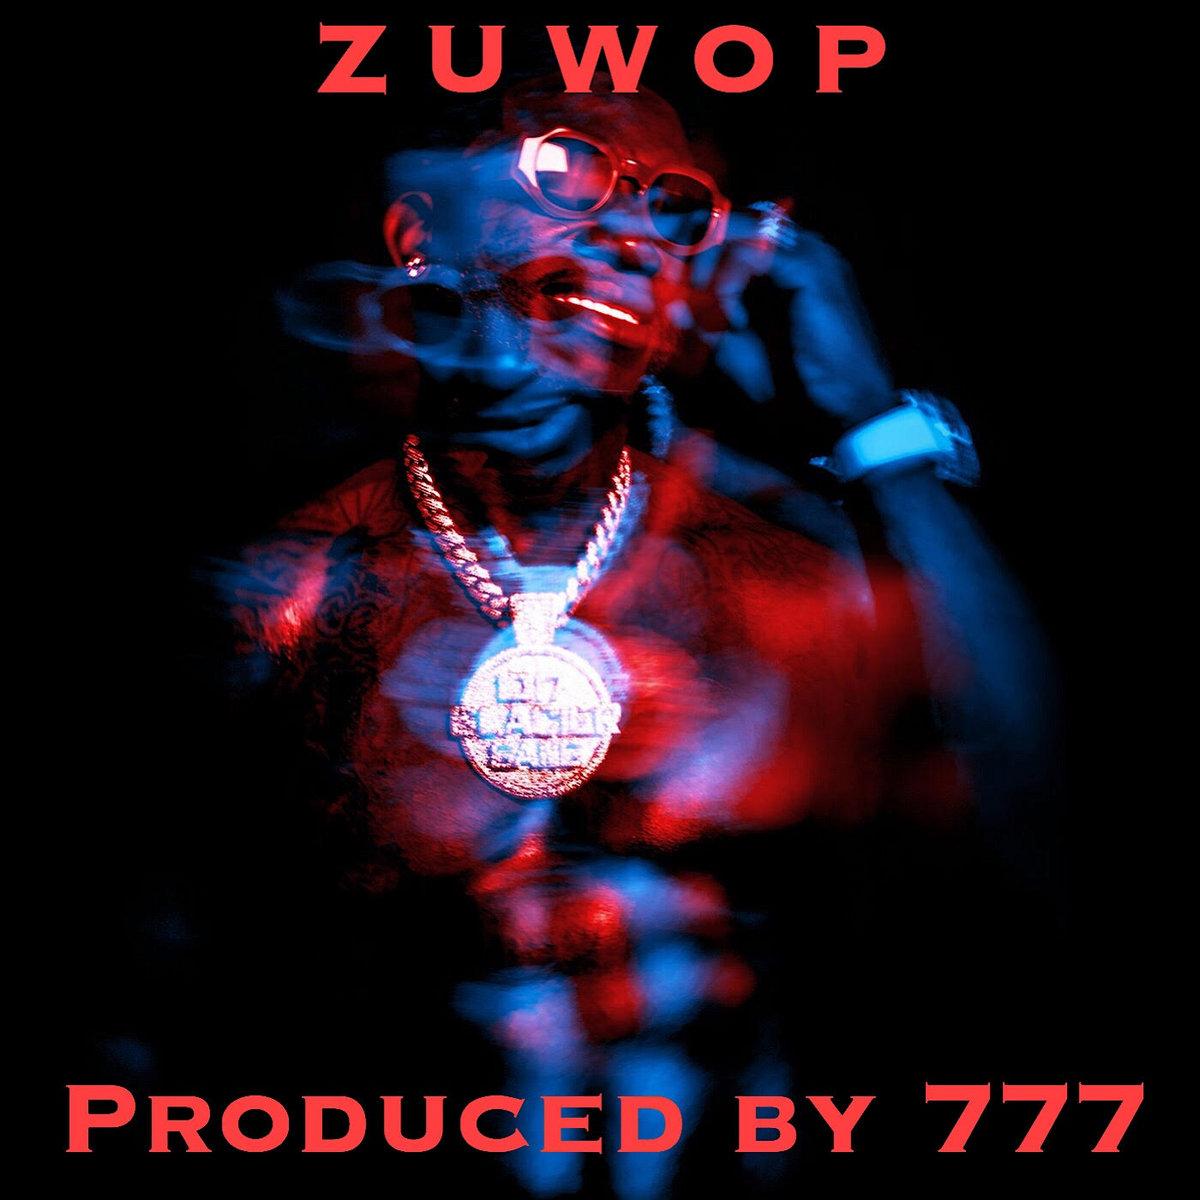 ZUWOP - GUCCI MANE, KEY GLOCK TYPE BEAT   777 original music